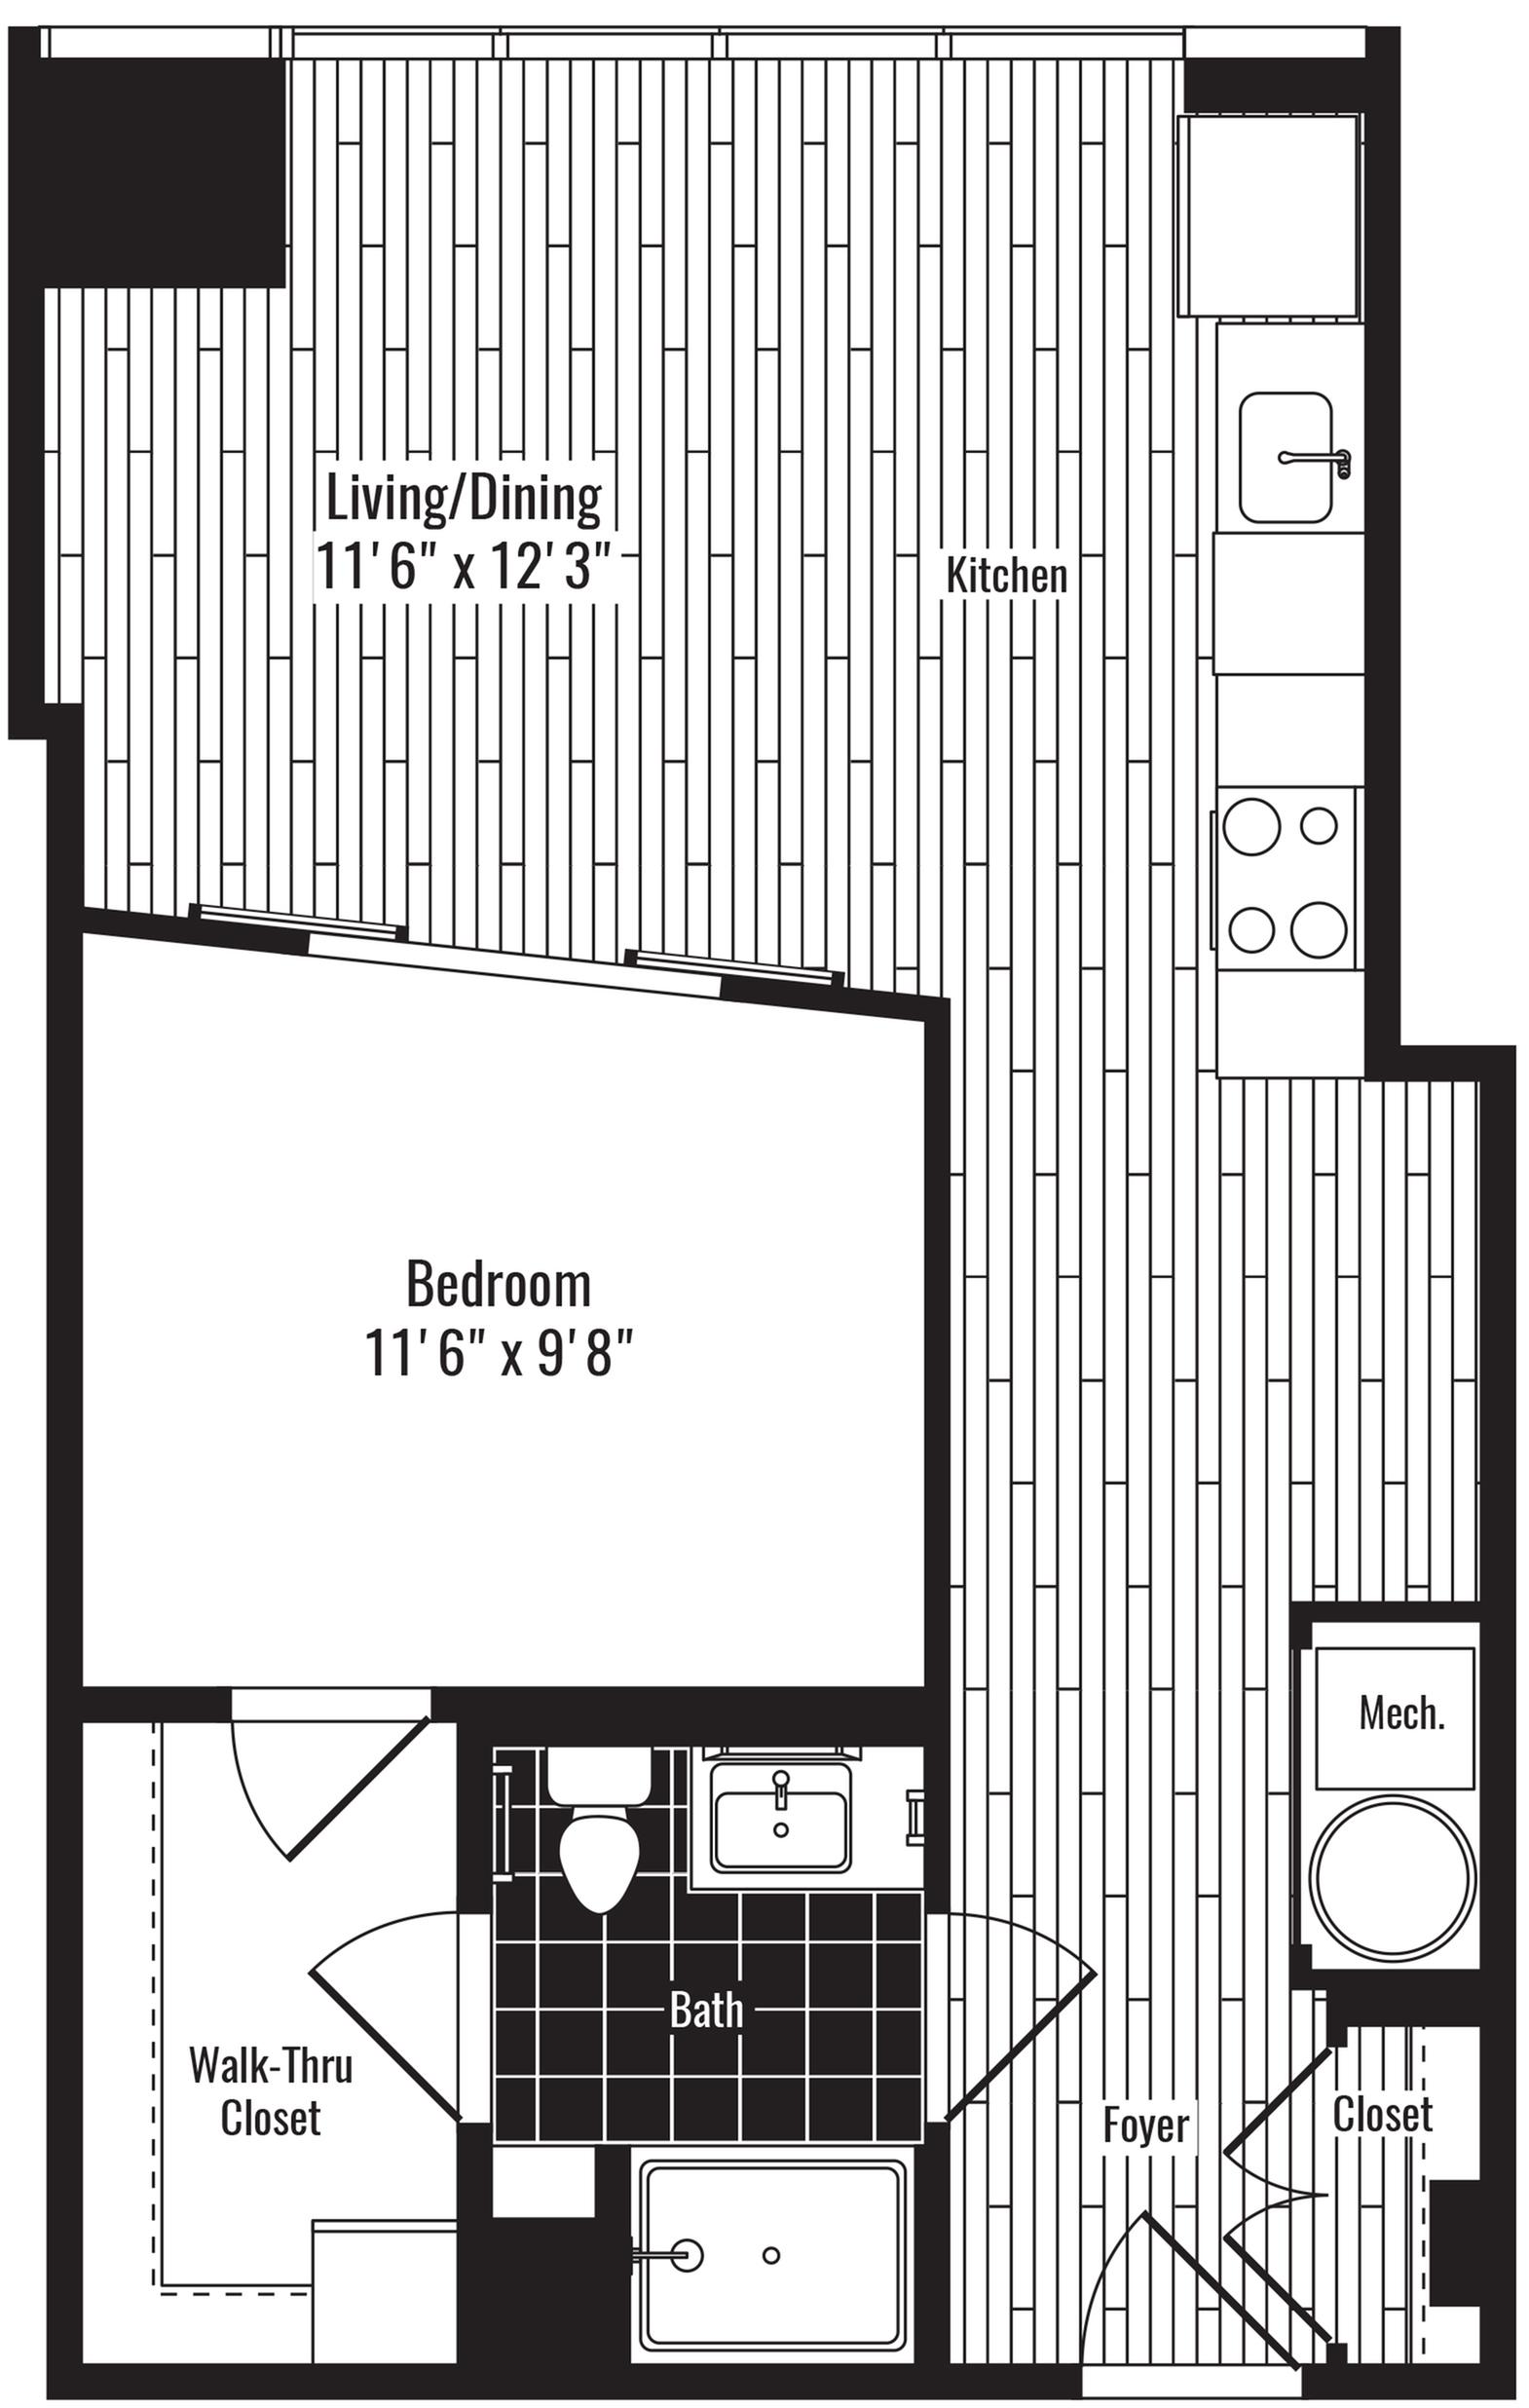 634 square foot one bedroom one bath apartment floorplan image